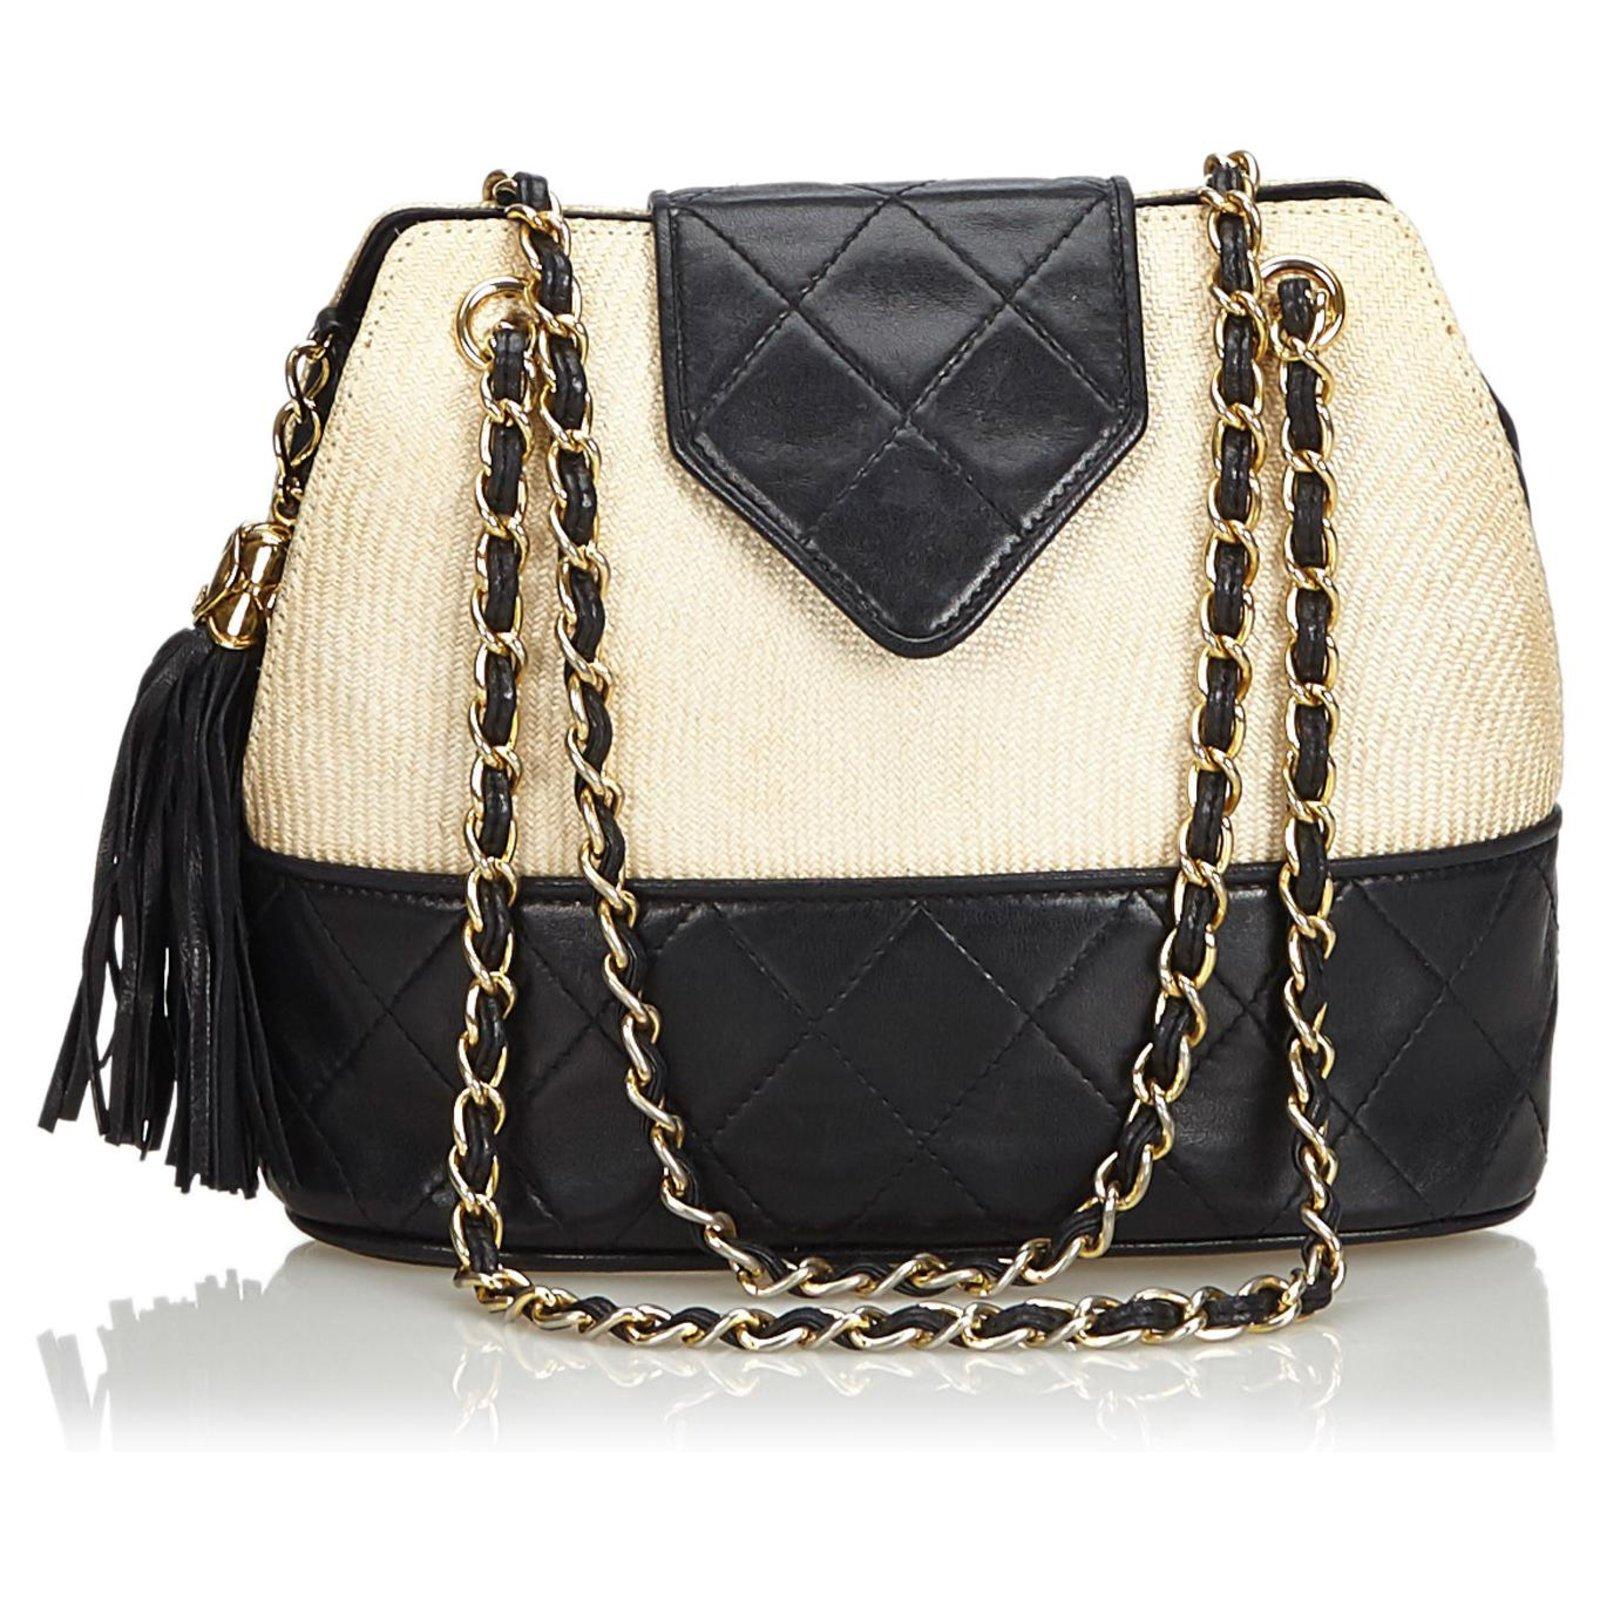 880acf389f8a Chanel Chanel White Woven Raffia Chain Shoulder Bag Handbags Leather,Other  Black,White,